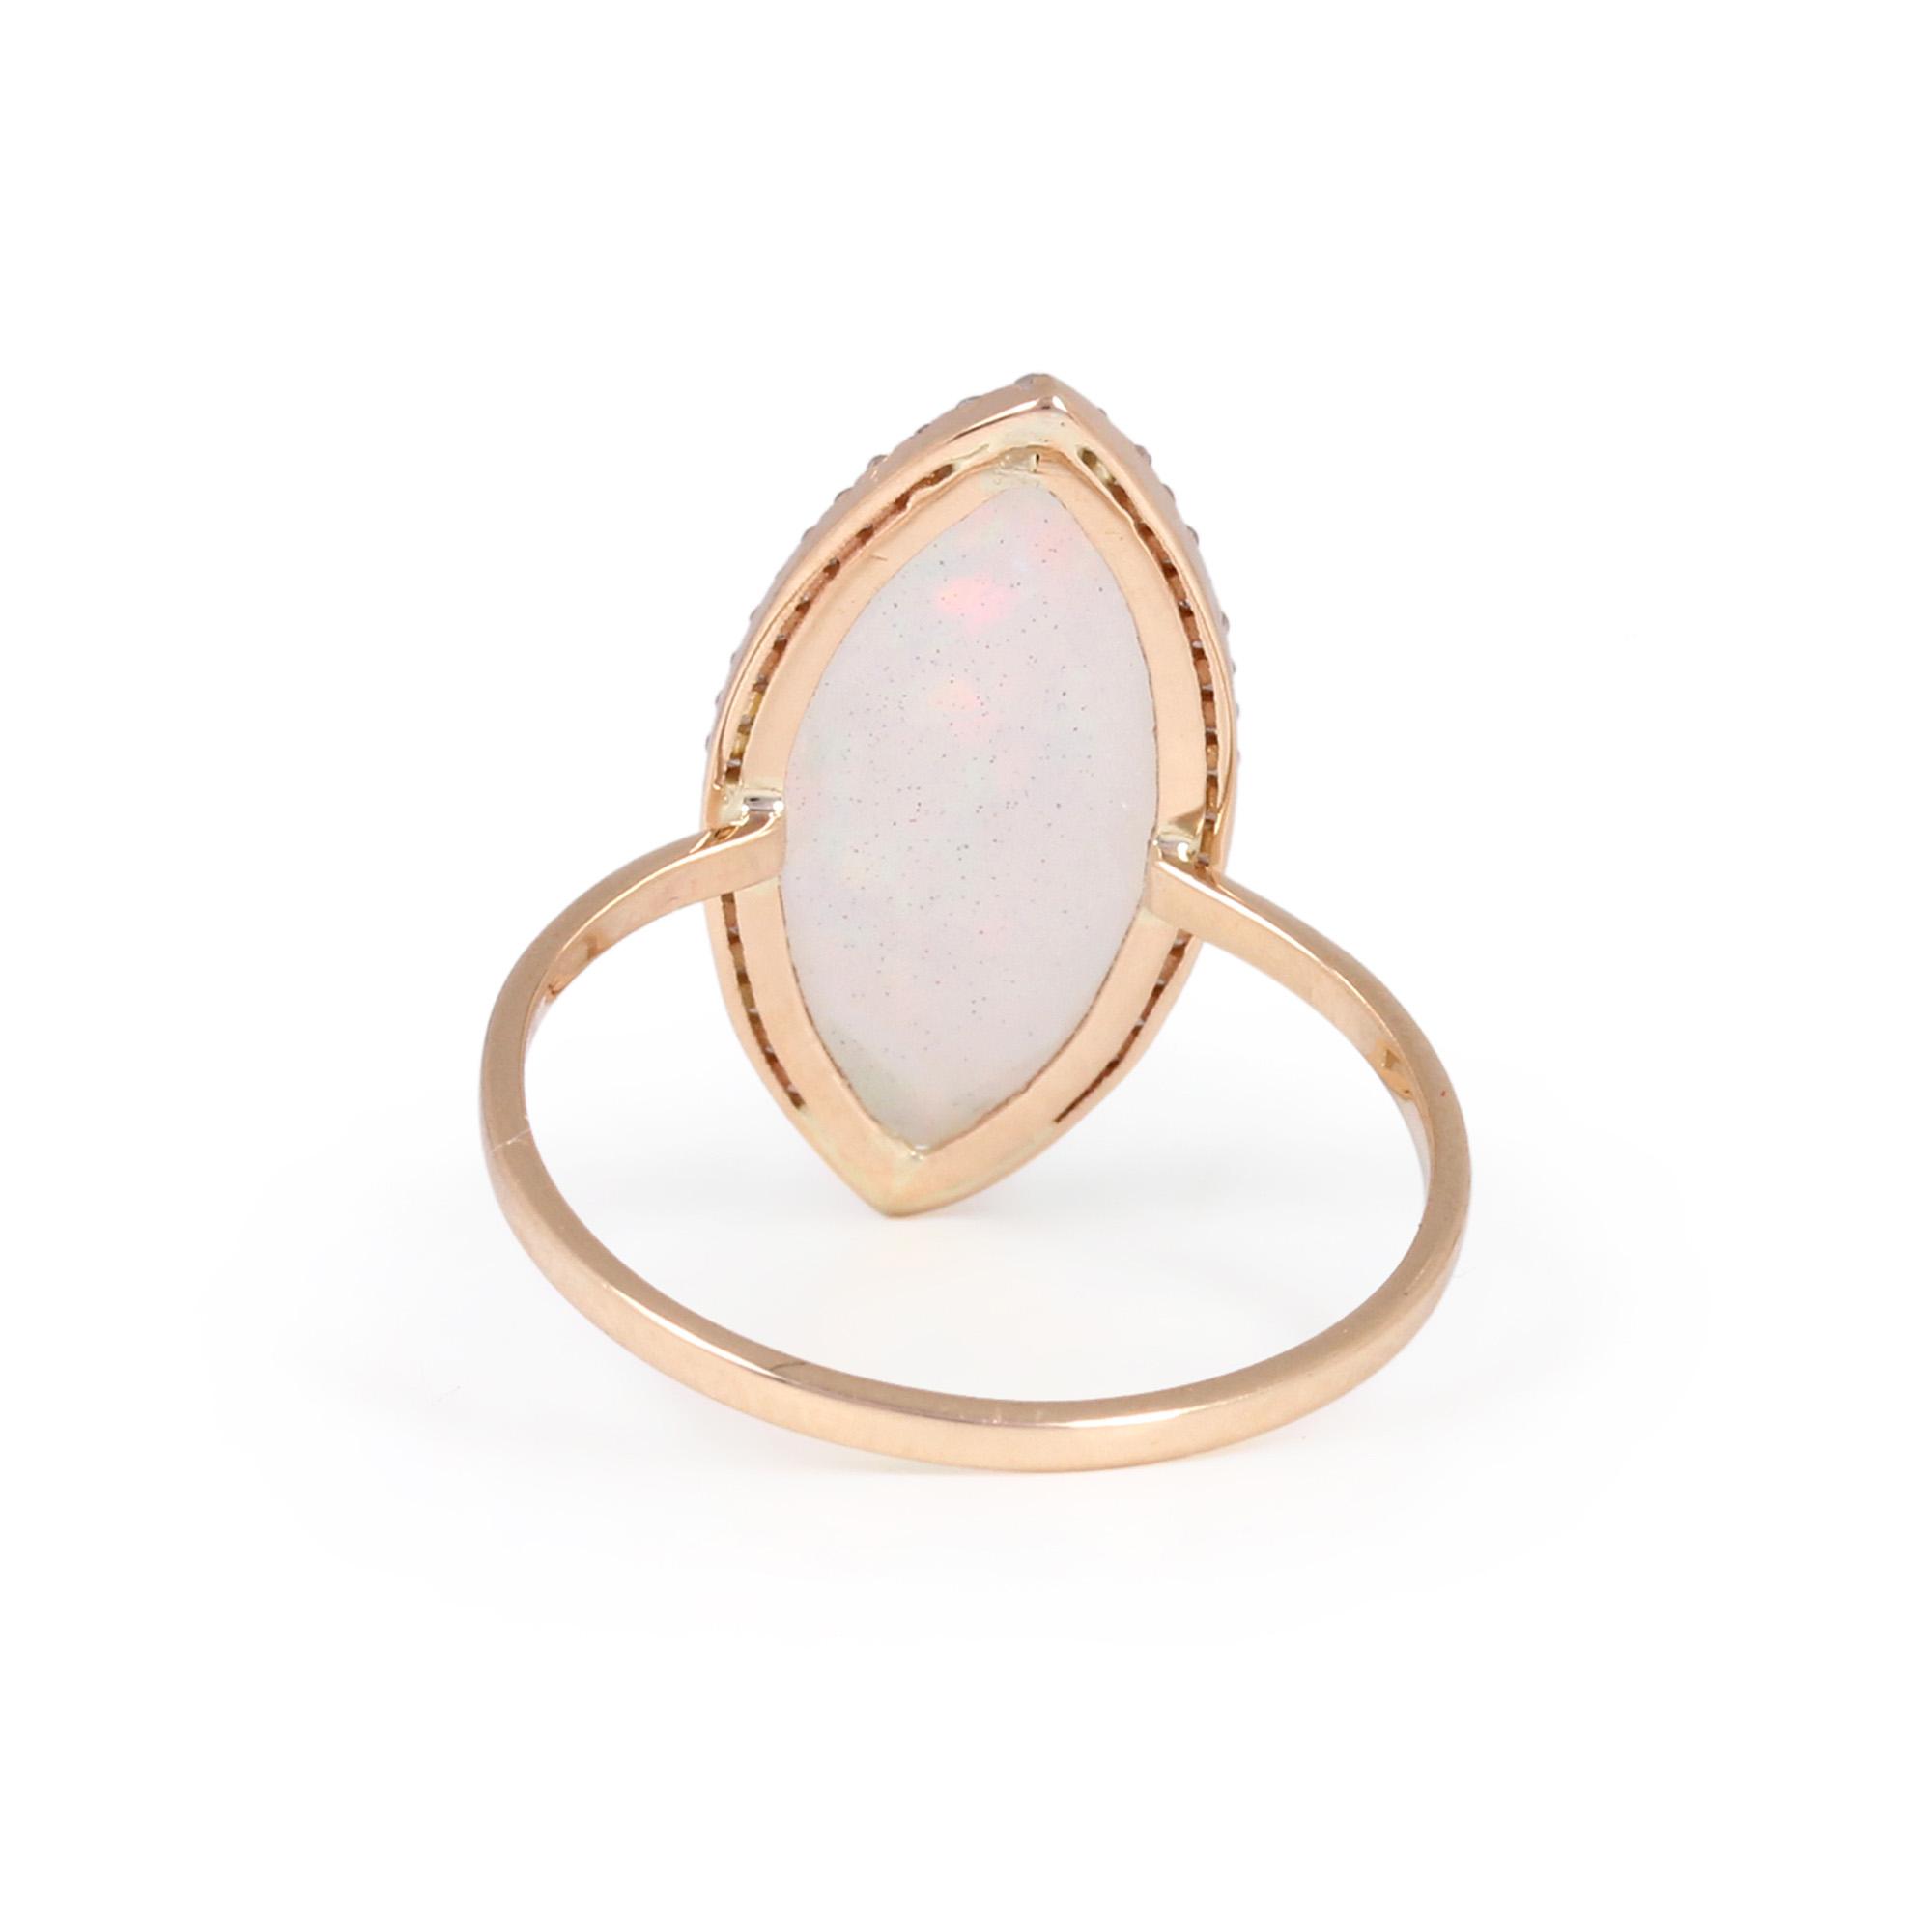 Gemstone Opal Natural Diamond Solid 14K Gold Ring